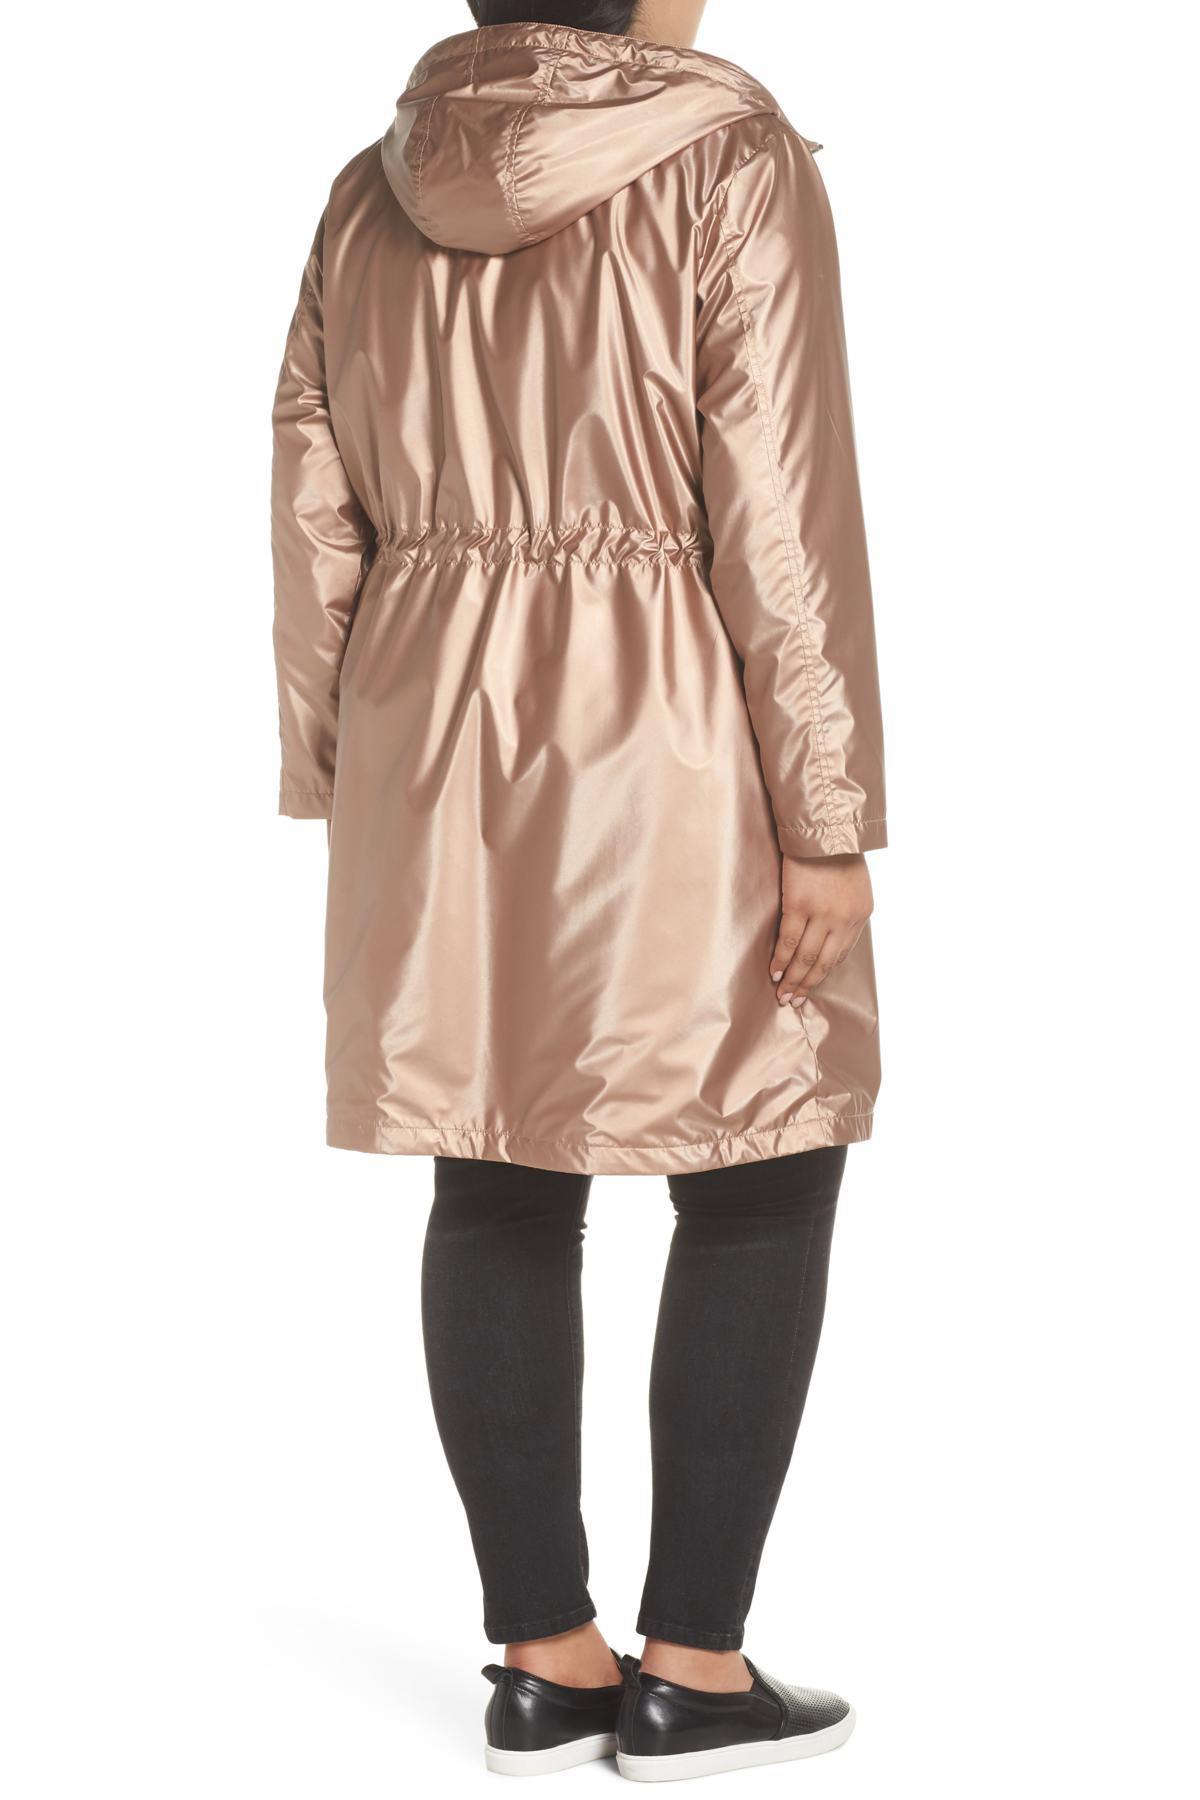 9ae7d0e6c6df9 Lyst - Bernardo Faux Fur Lined Metallic Rain Jacket (plus Size)